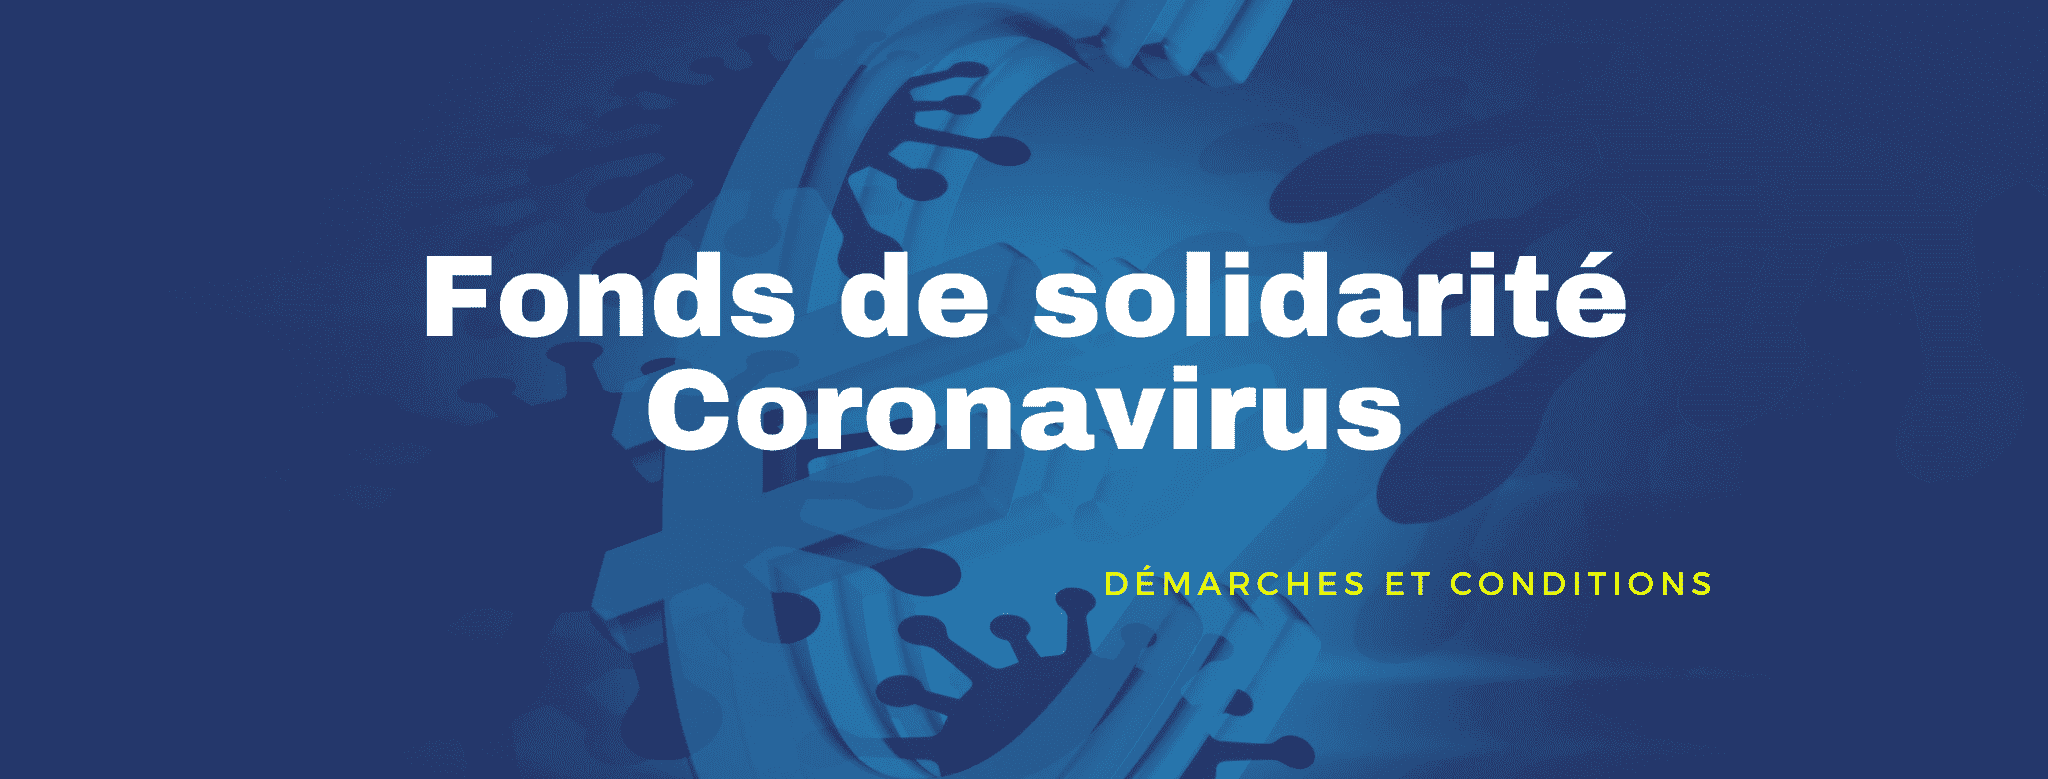 Fonds de solidarité Coronavirus